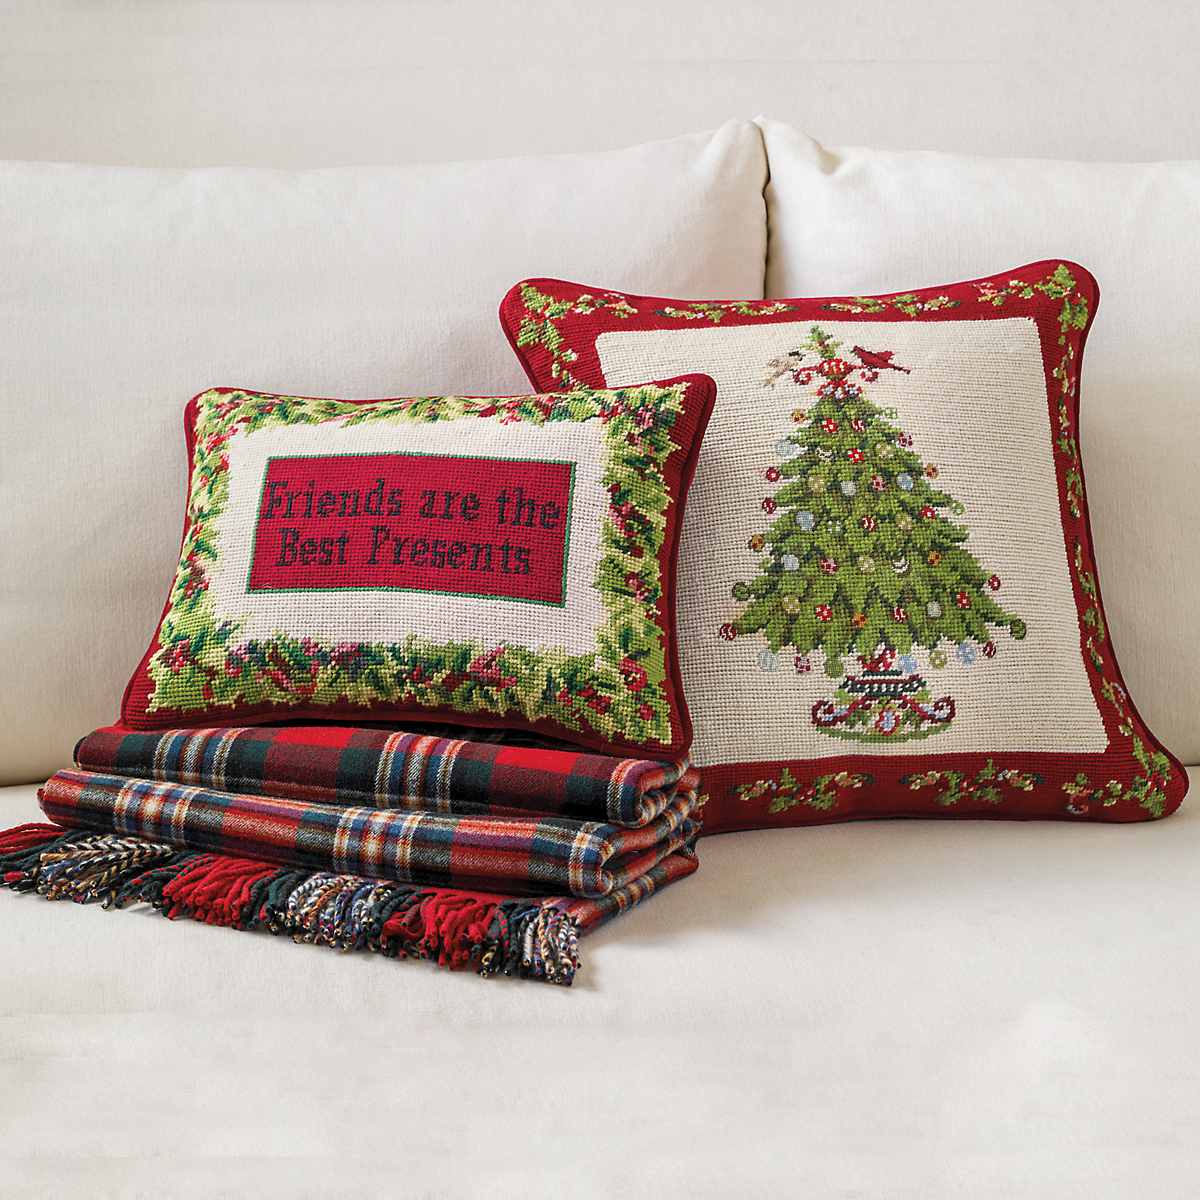 furniture pillows crosby throw christmas sale on slipcover market sofa world pillow